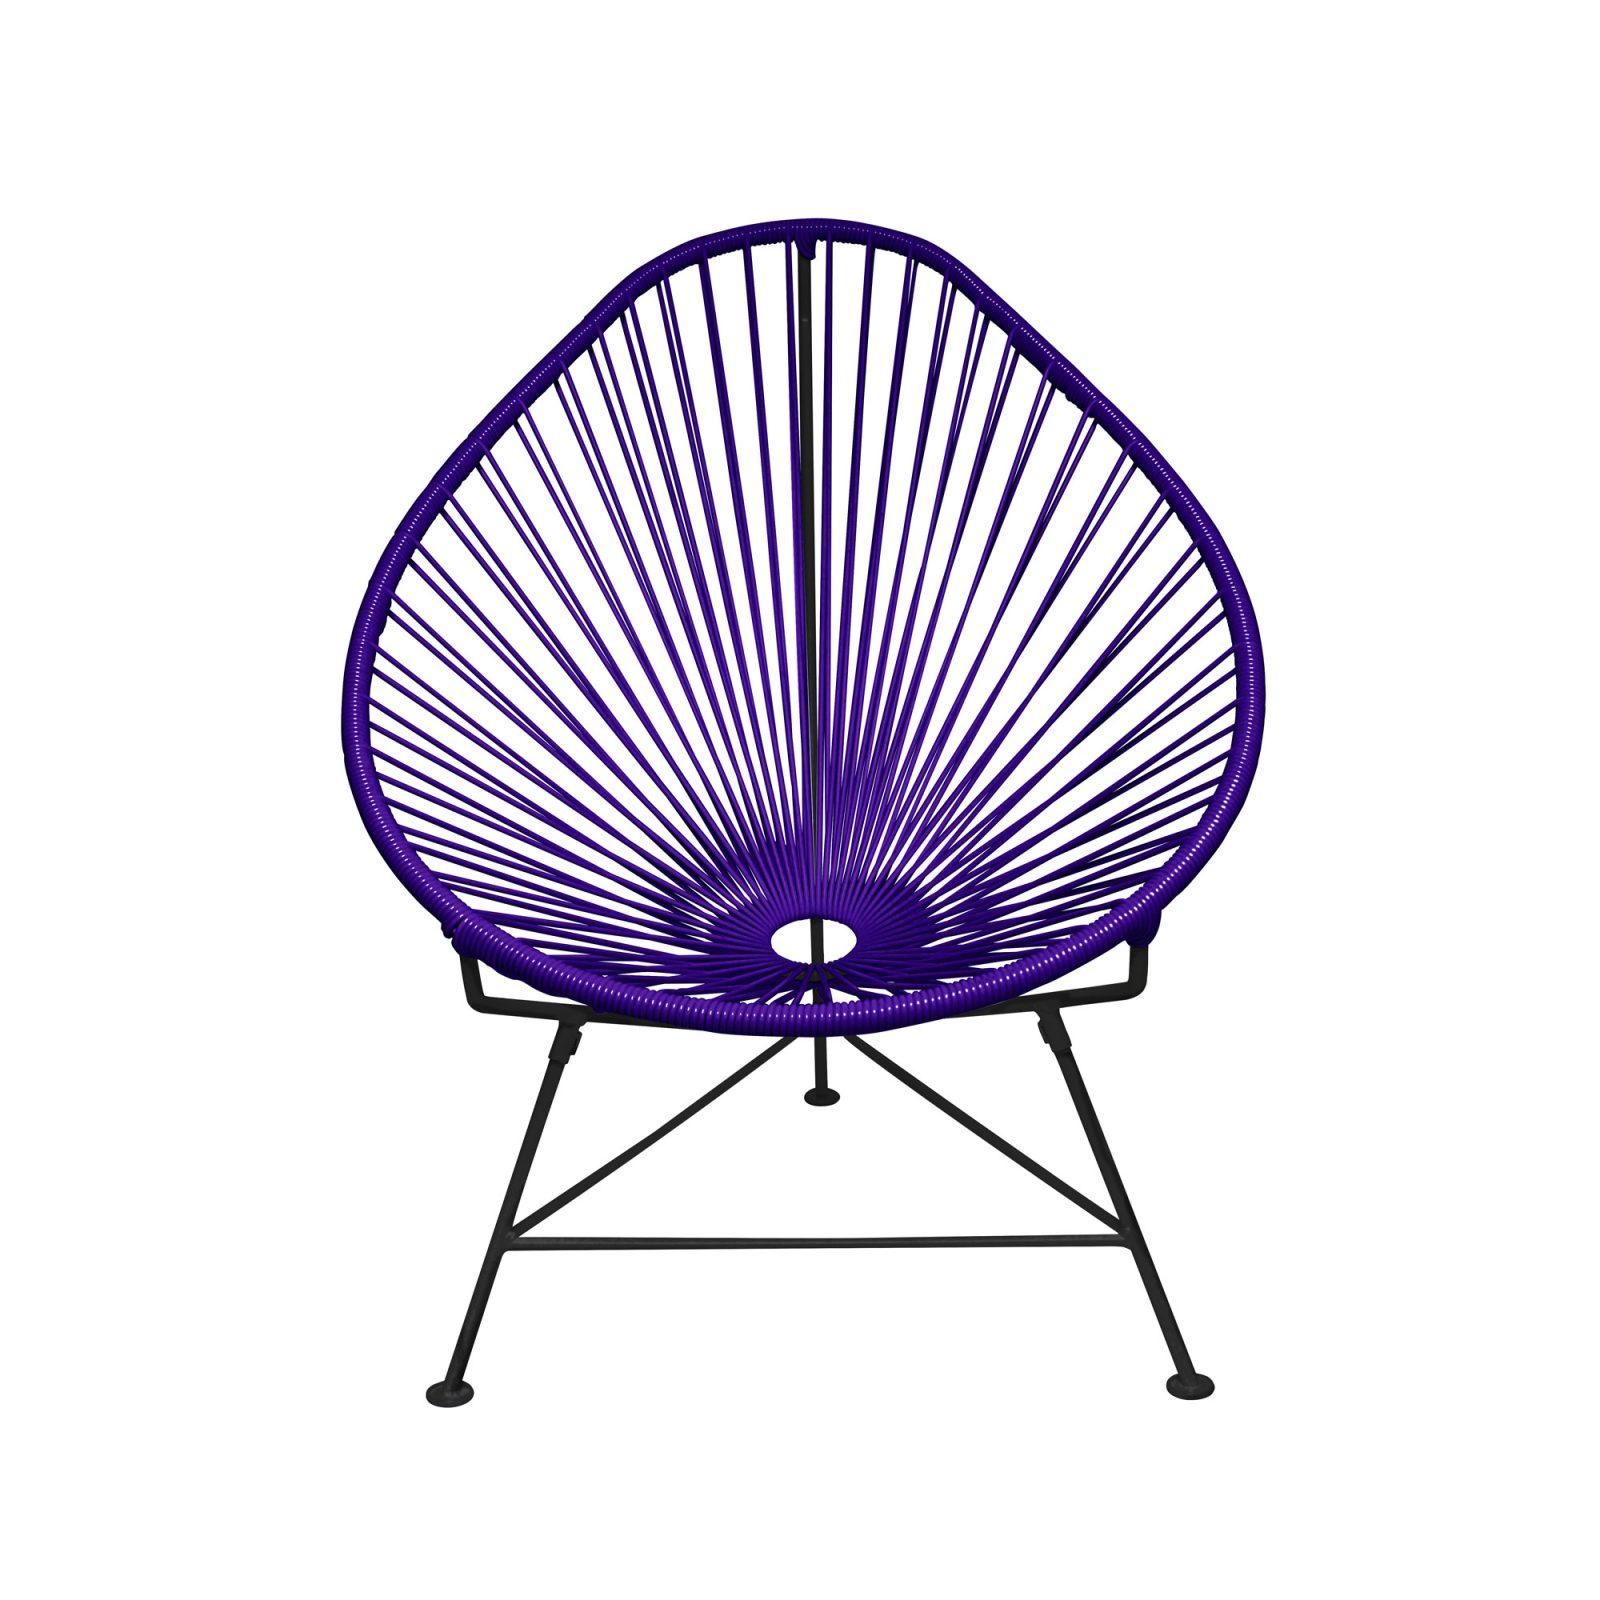 acapulco-chair-black-frame-purple